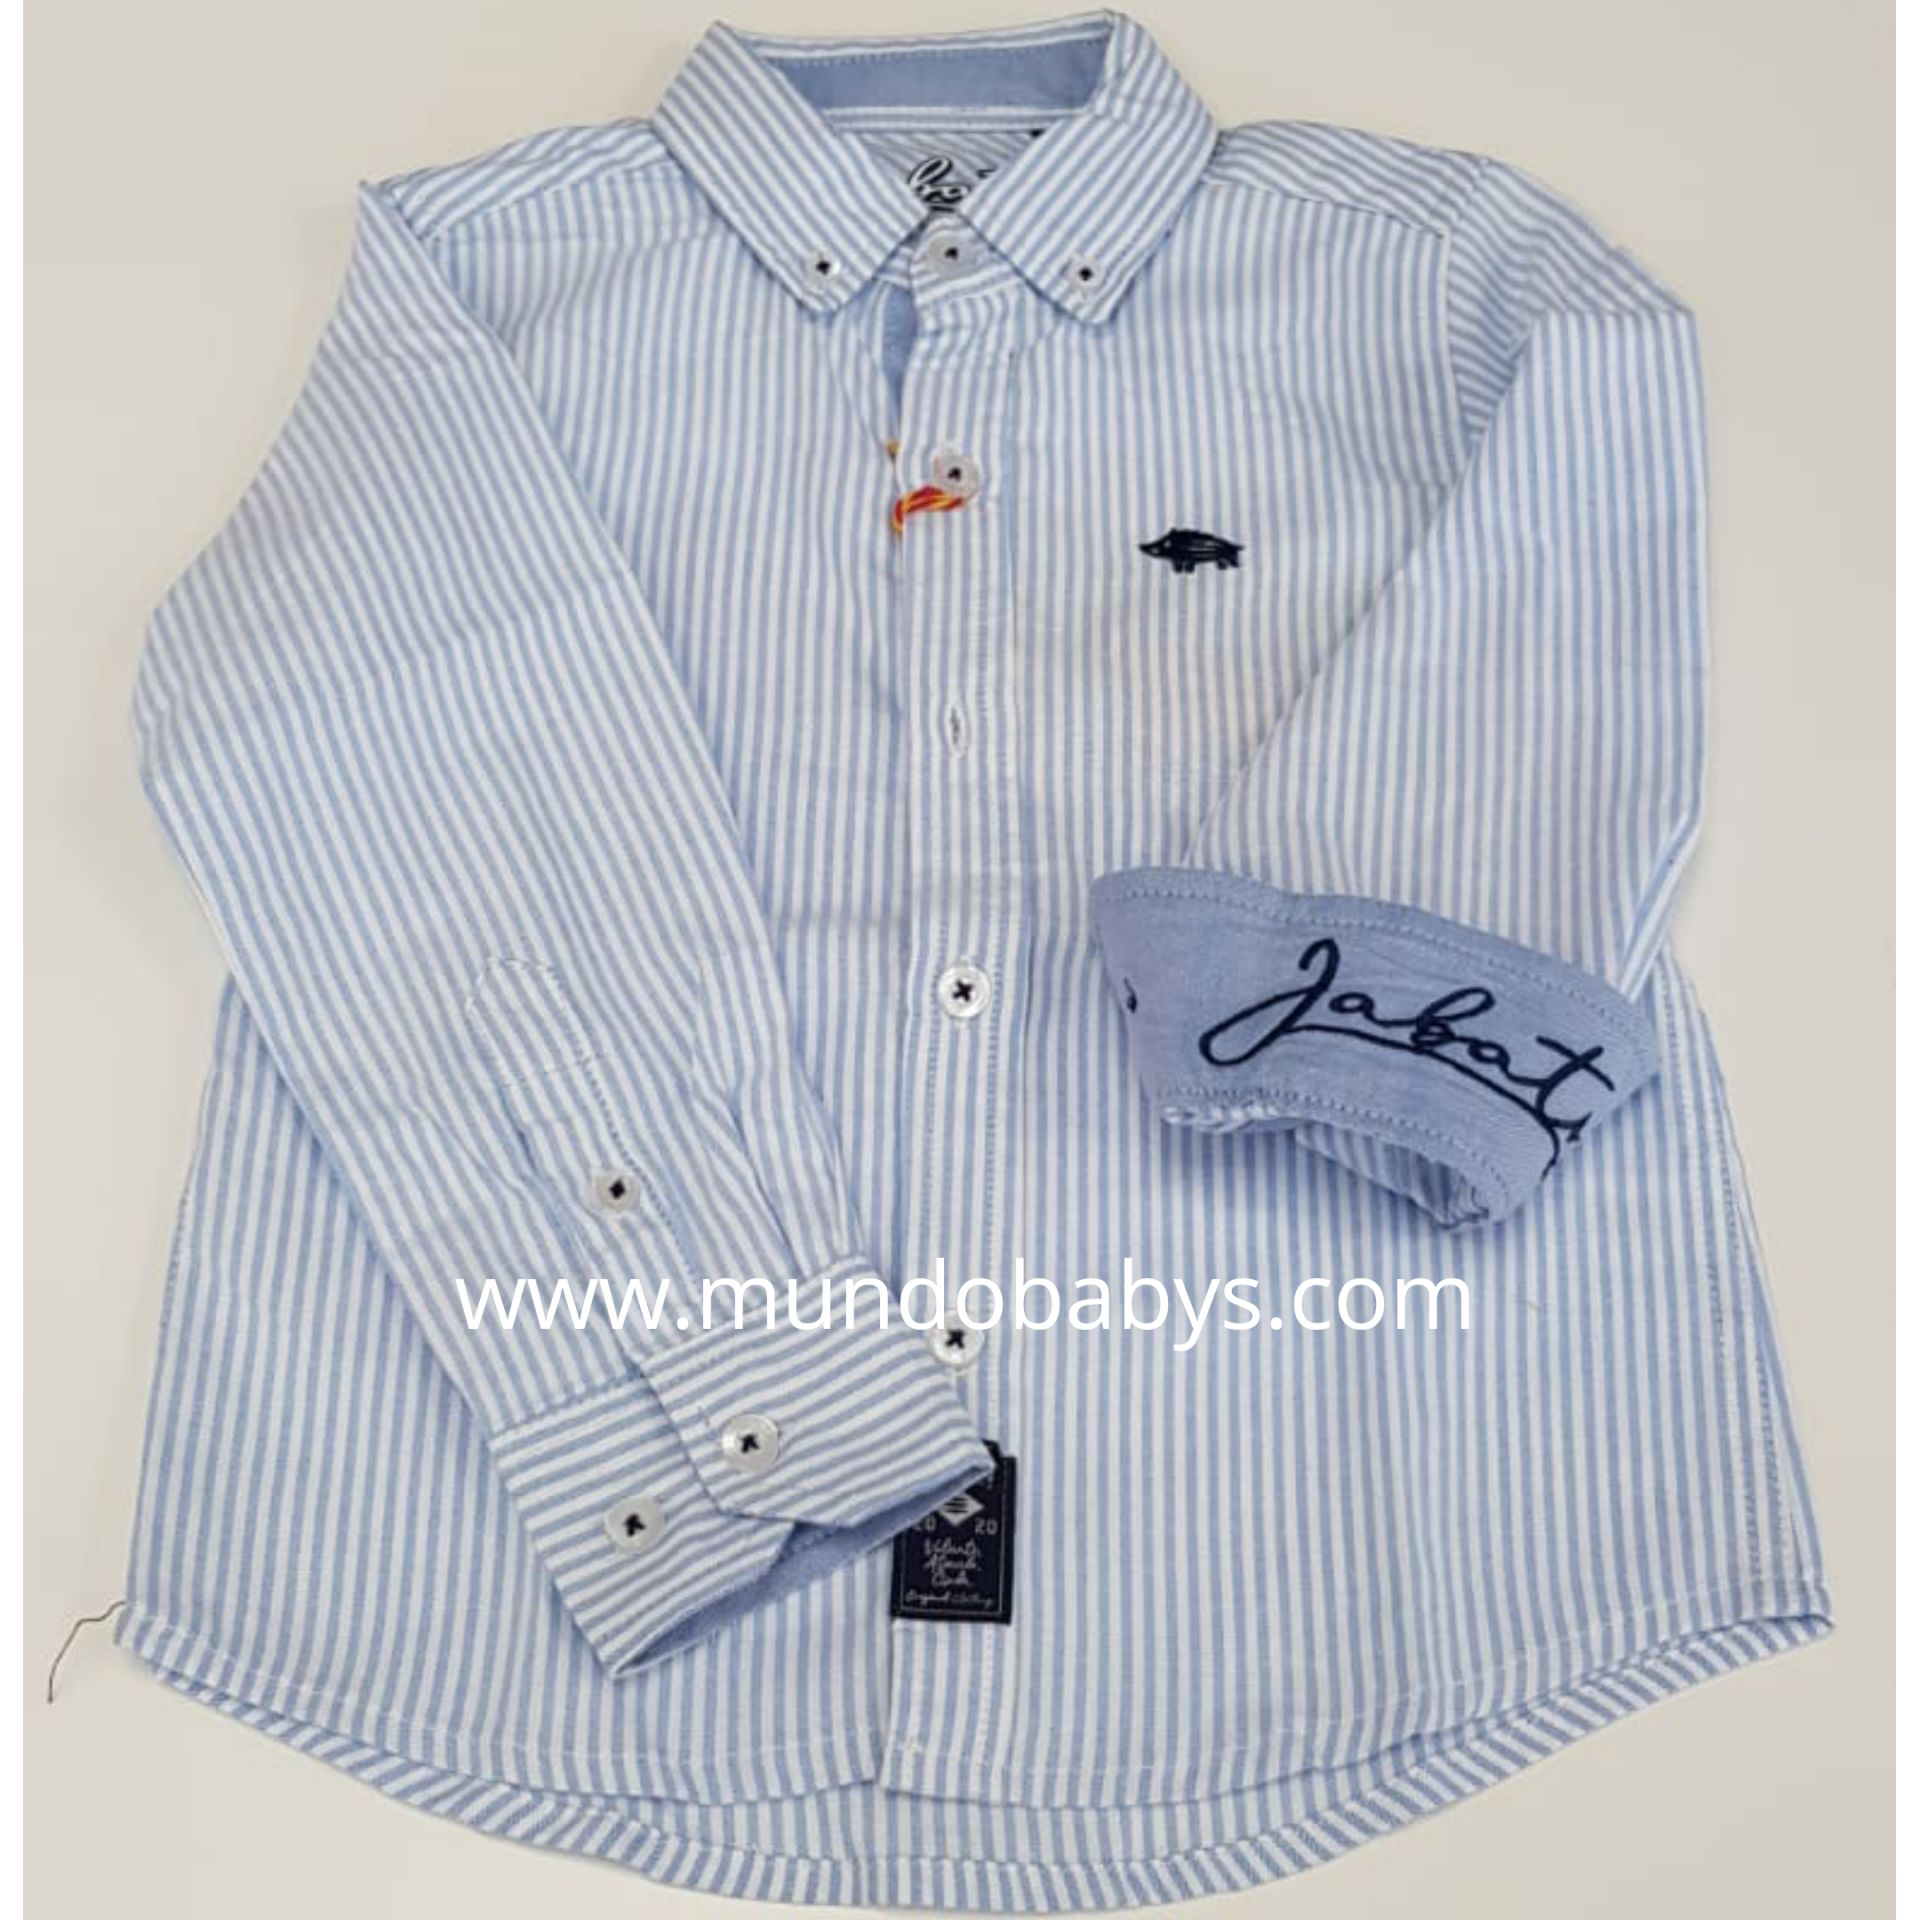 Camisa manga larga rayas celeste y blanco